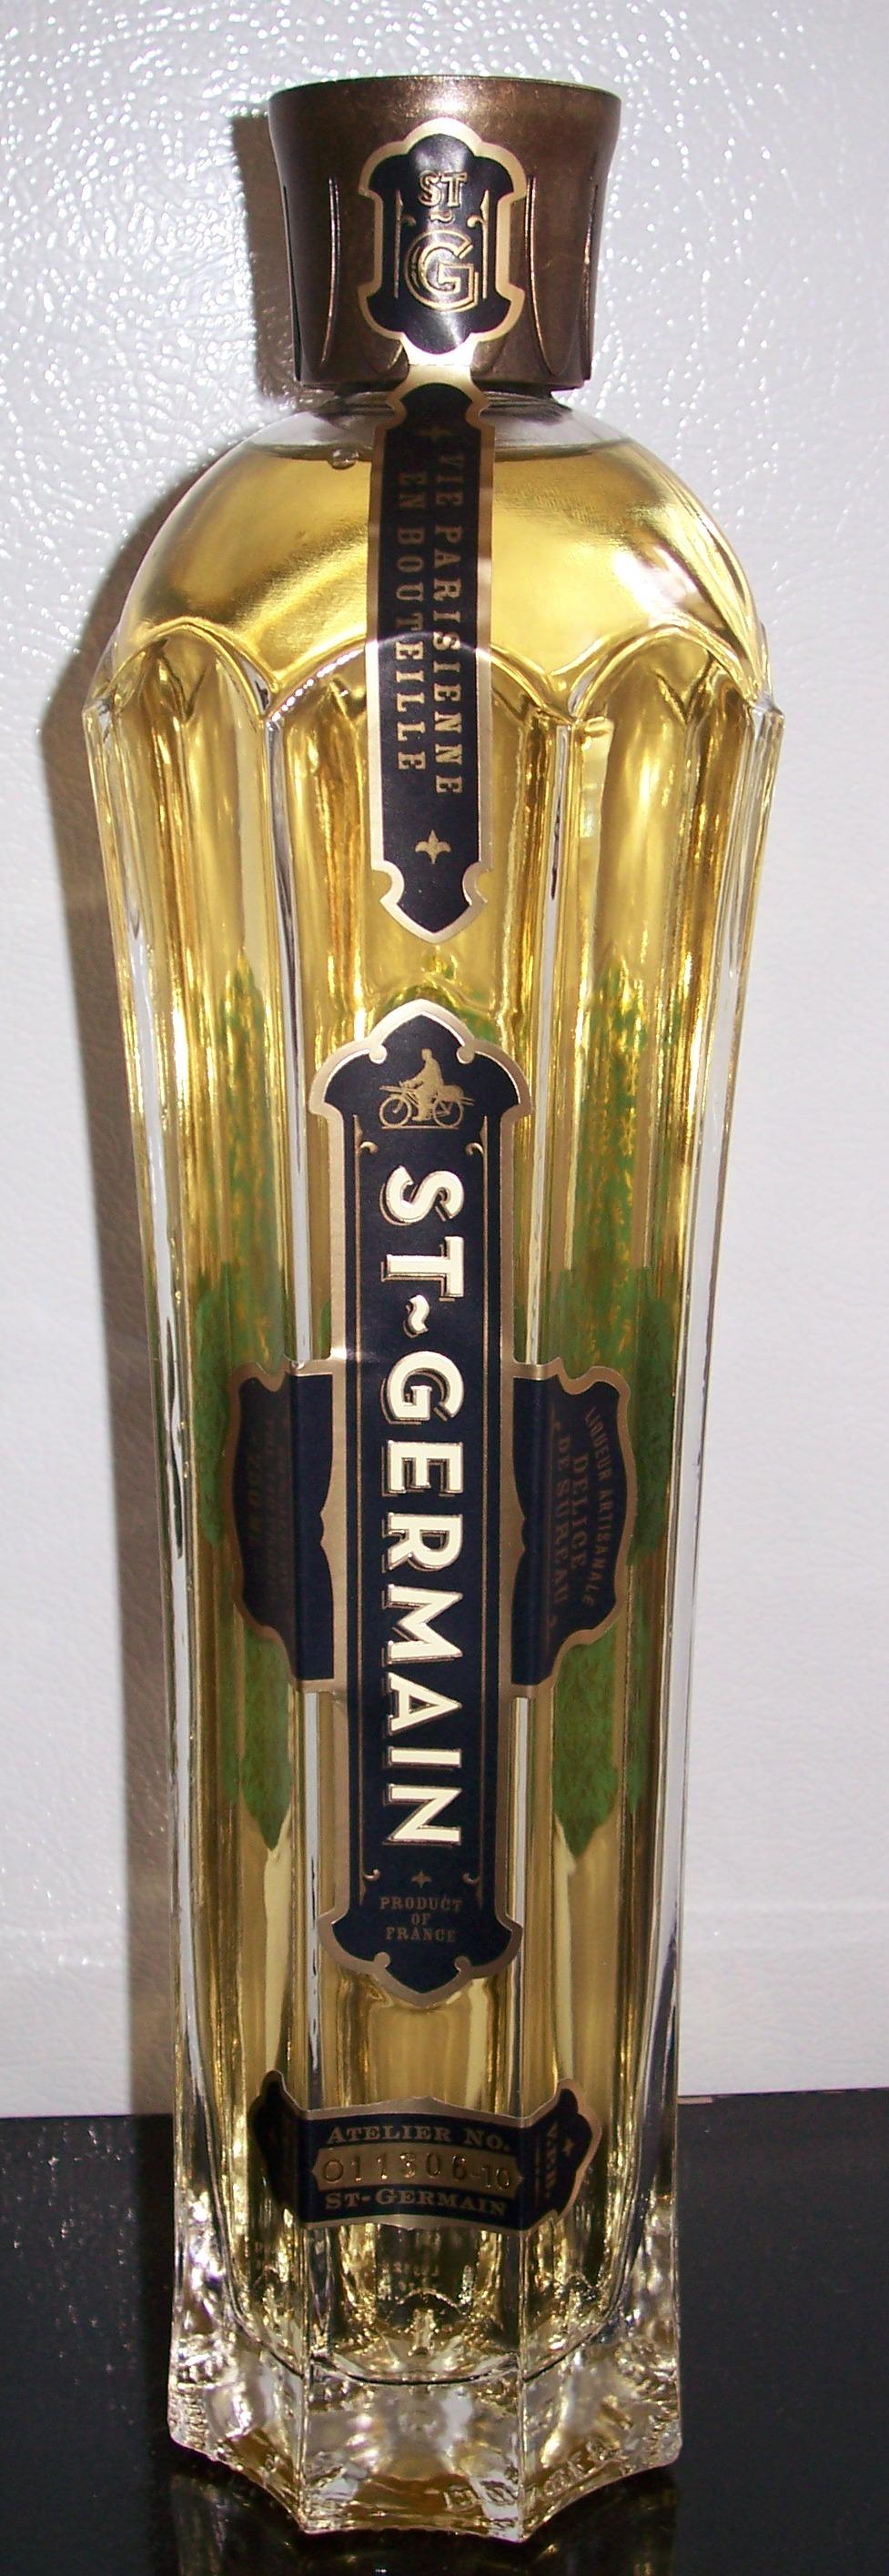 File:Bottle of St. Germain Elderflower liqueur.jpg - Wikimedia Commons